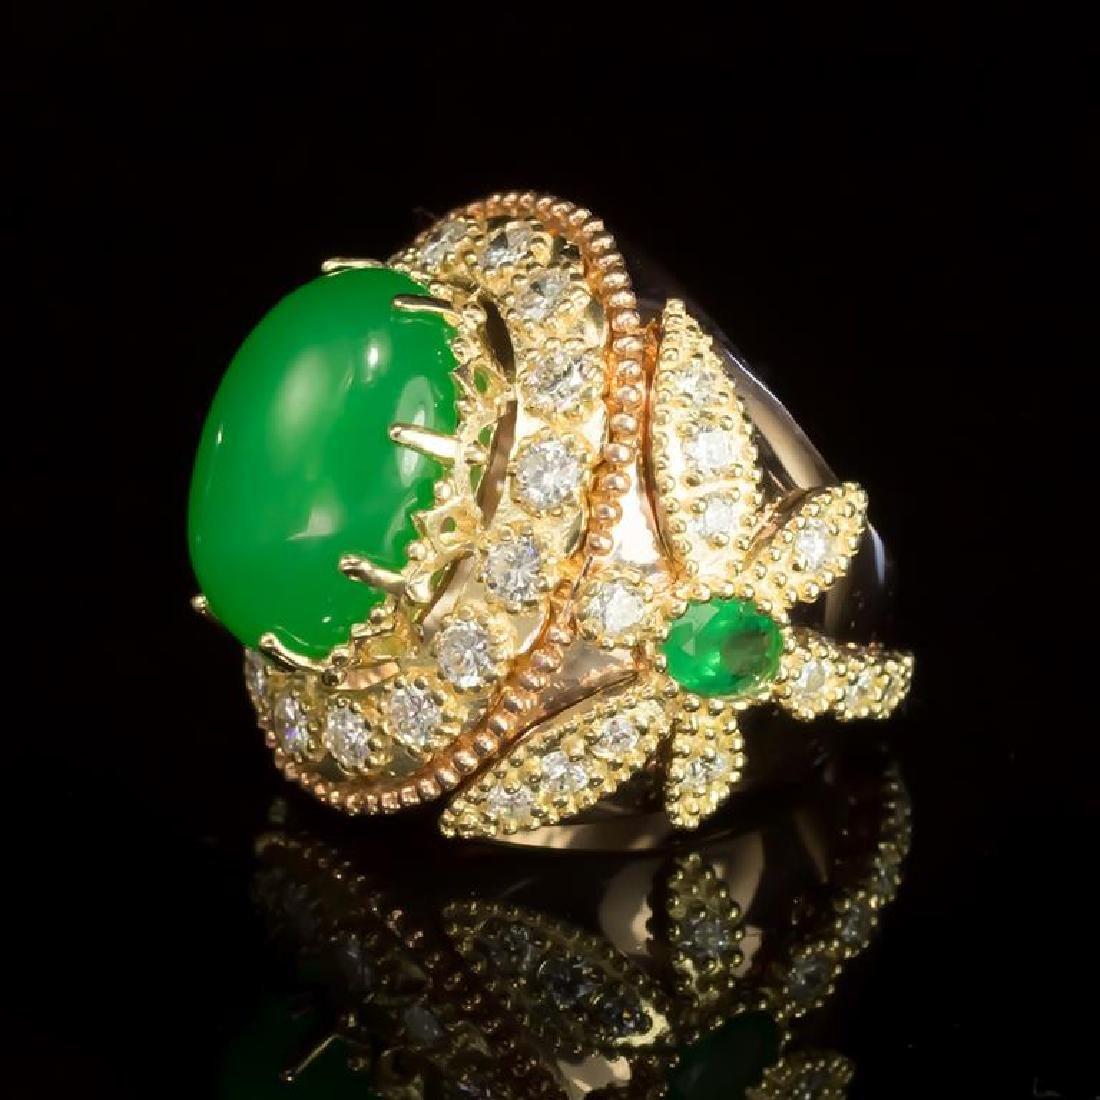 14K Gold 9.02ct Jadeite, 1.05ct Emerald 2.35ct Diamond - 2